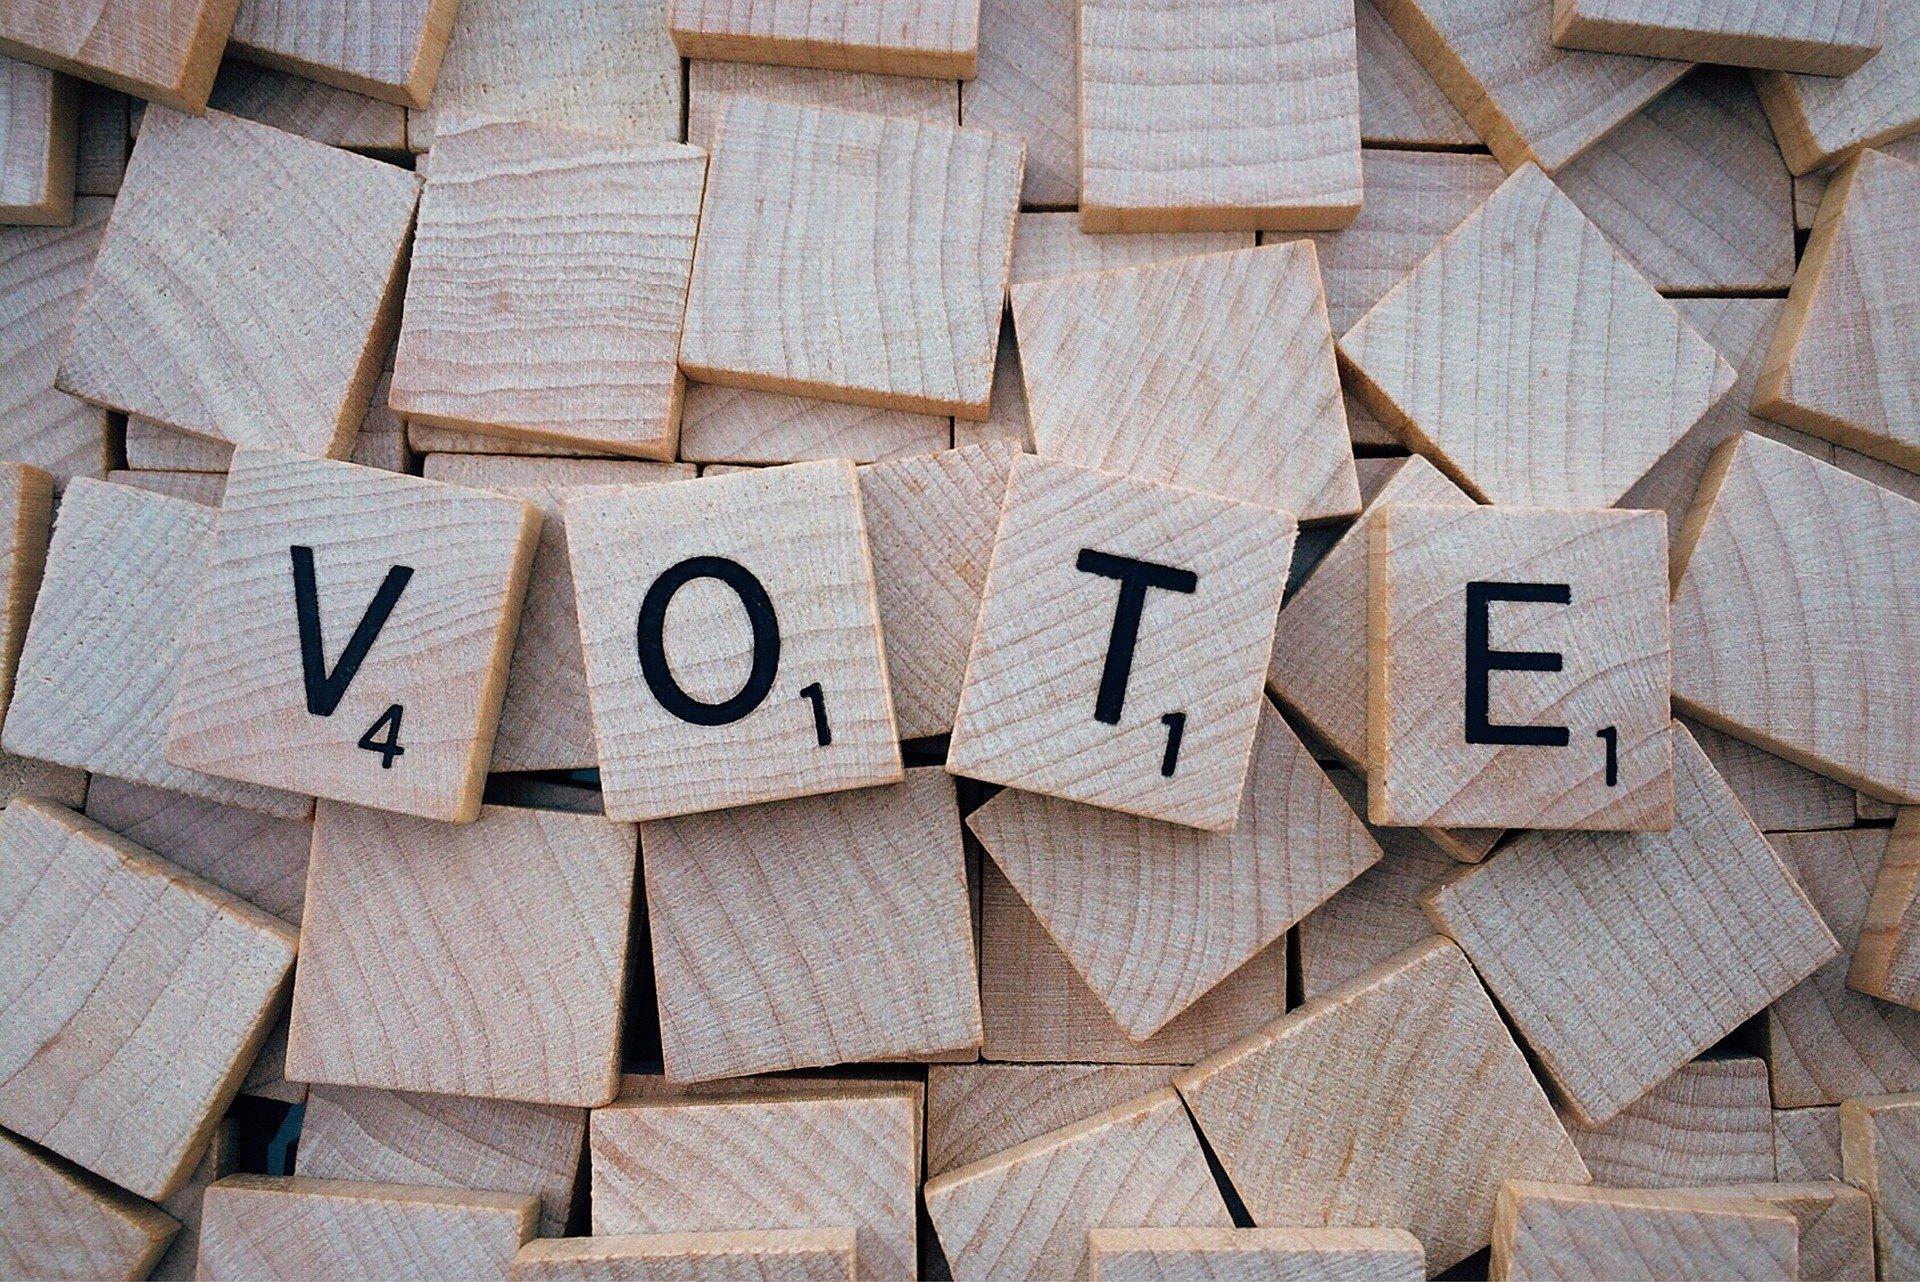 vote - elections - smartmatic